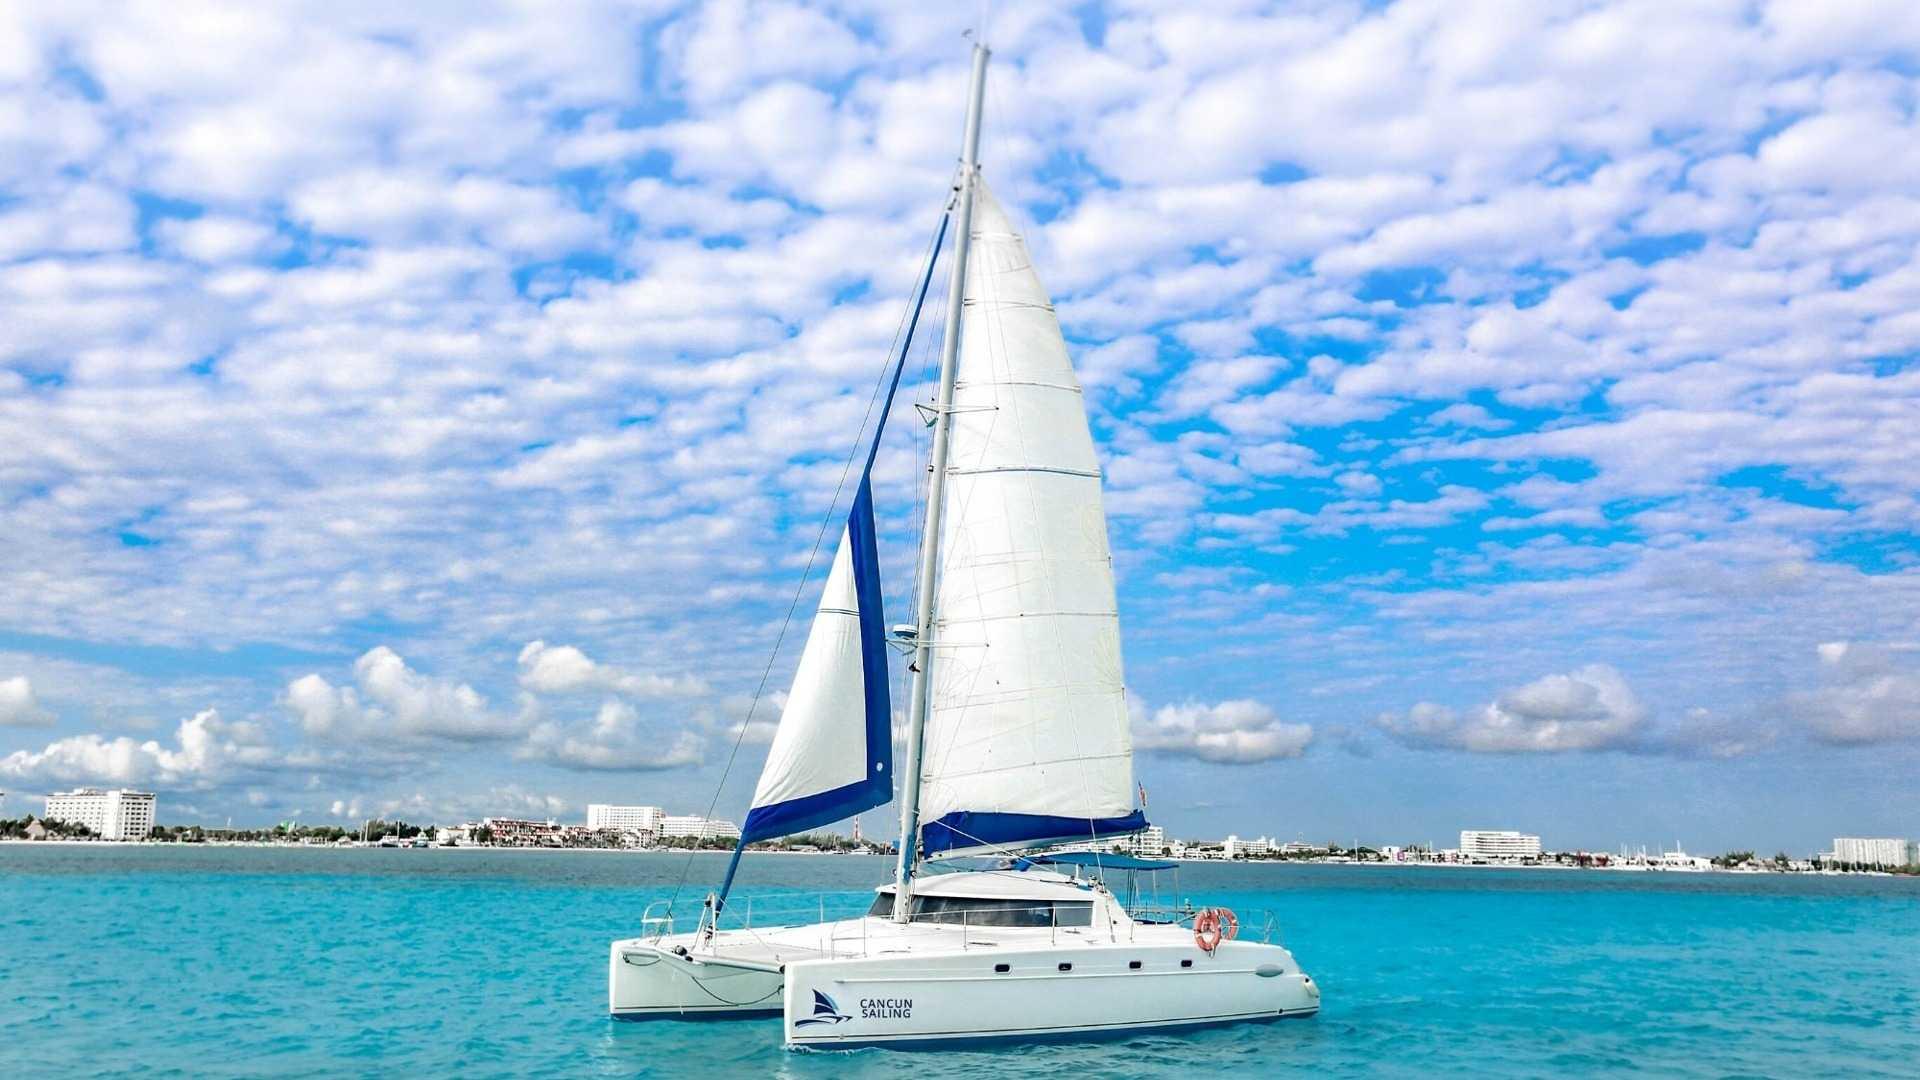 5 - LoRes - 4 Vents - Isla Mujeres Catamaran Tour - Cancun Sailing